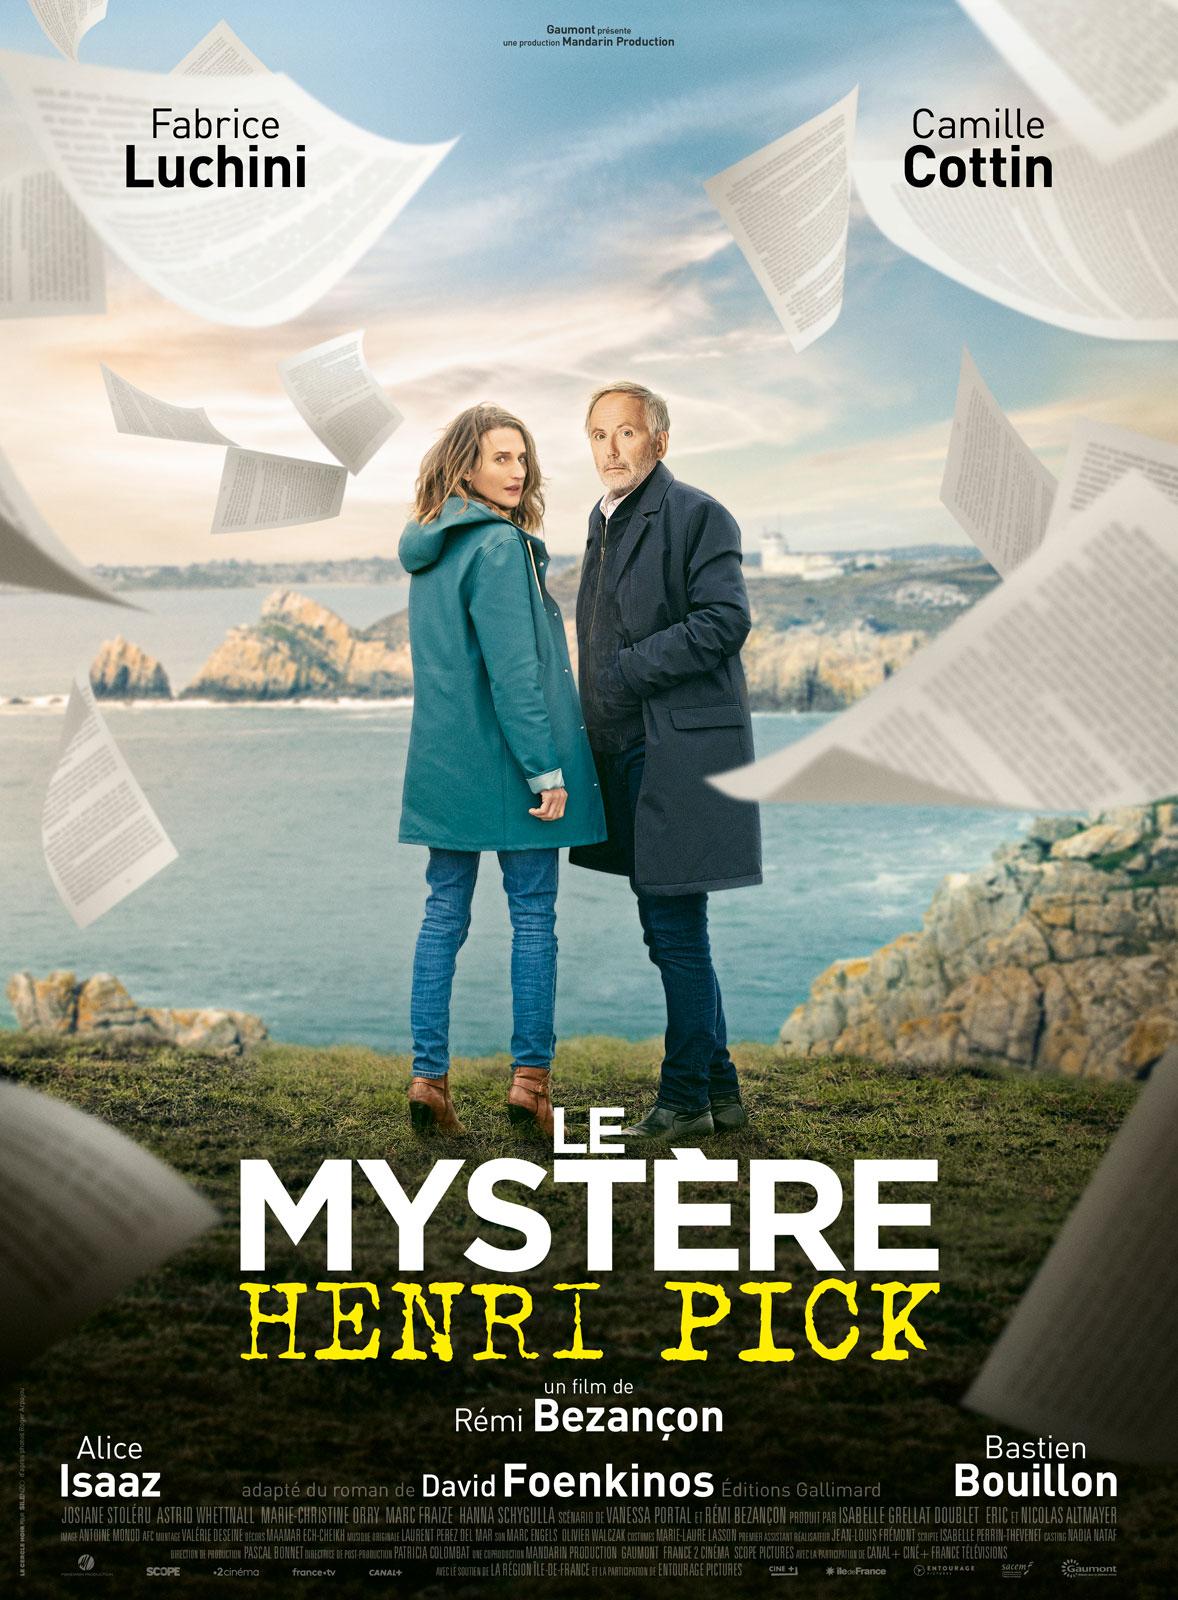 Le Mystere Henri Pick Histoire Vraie : mystere, henri, histoire, vraie, Mystère, Henri, AlloCiné